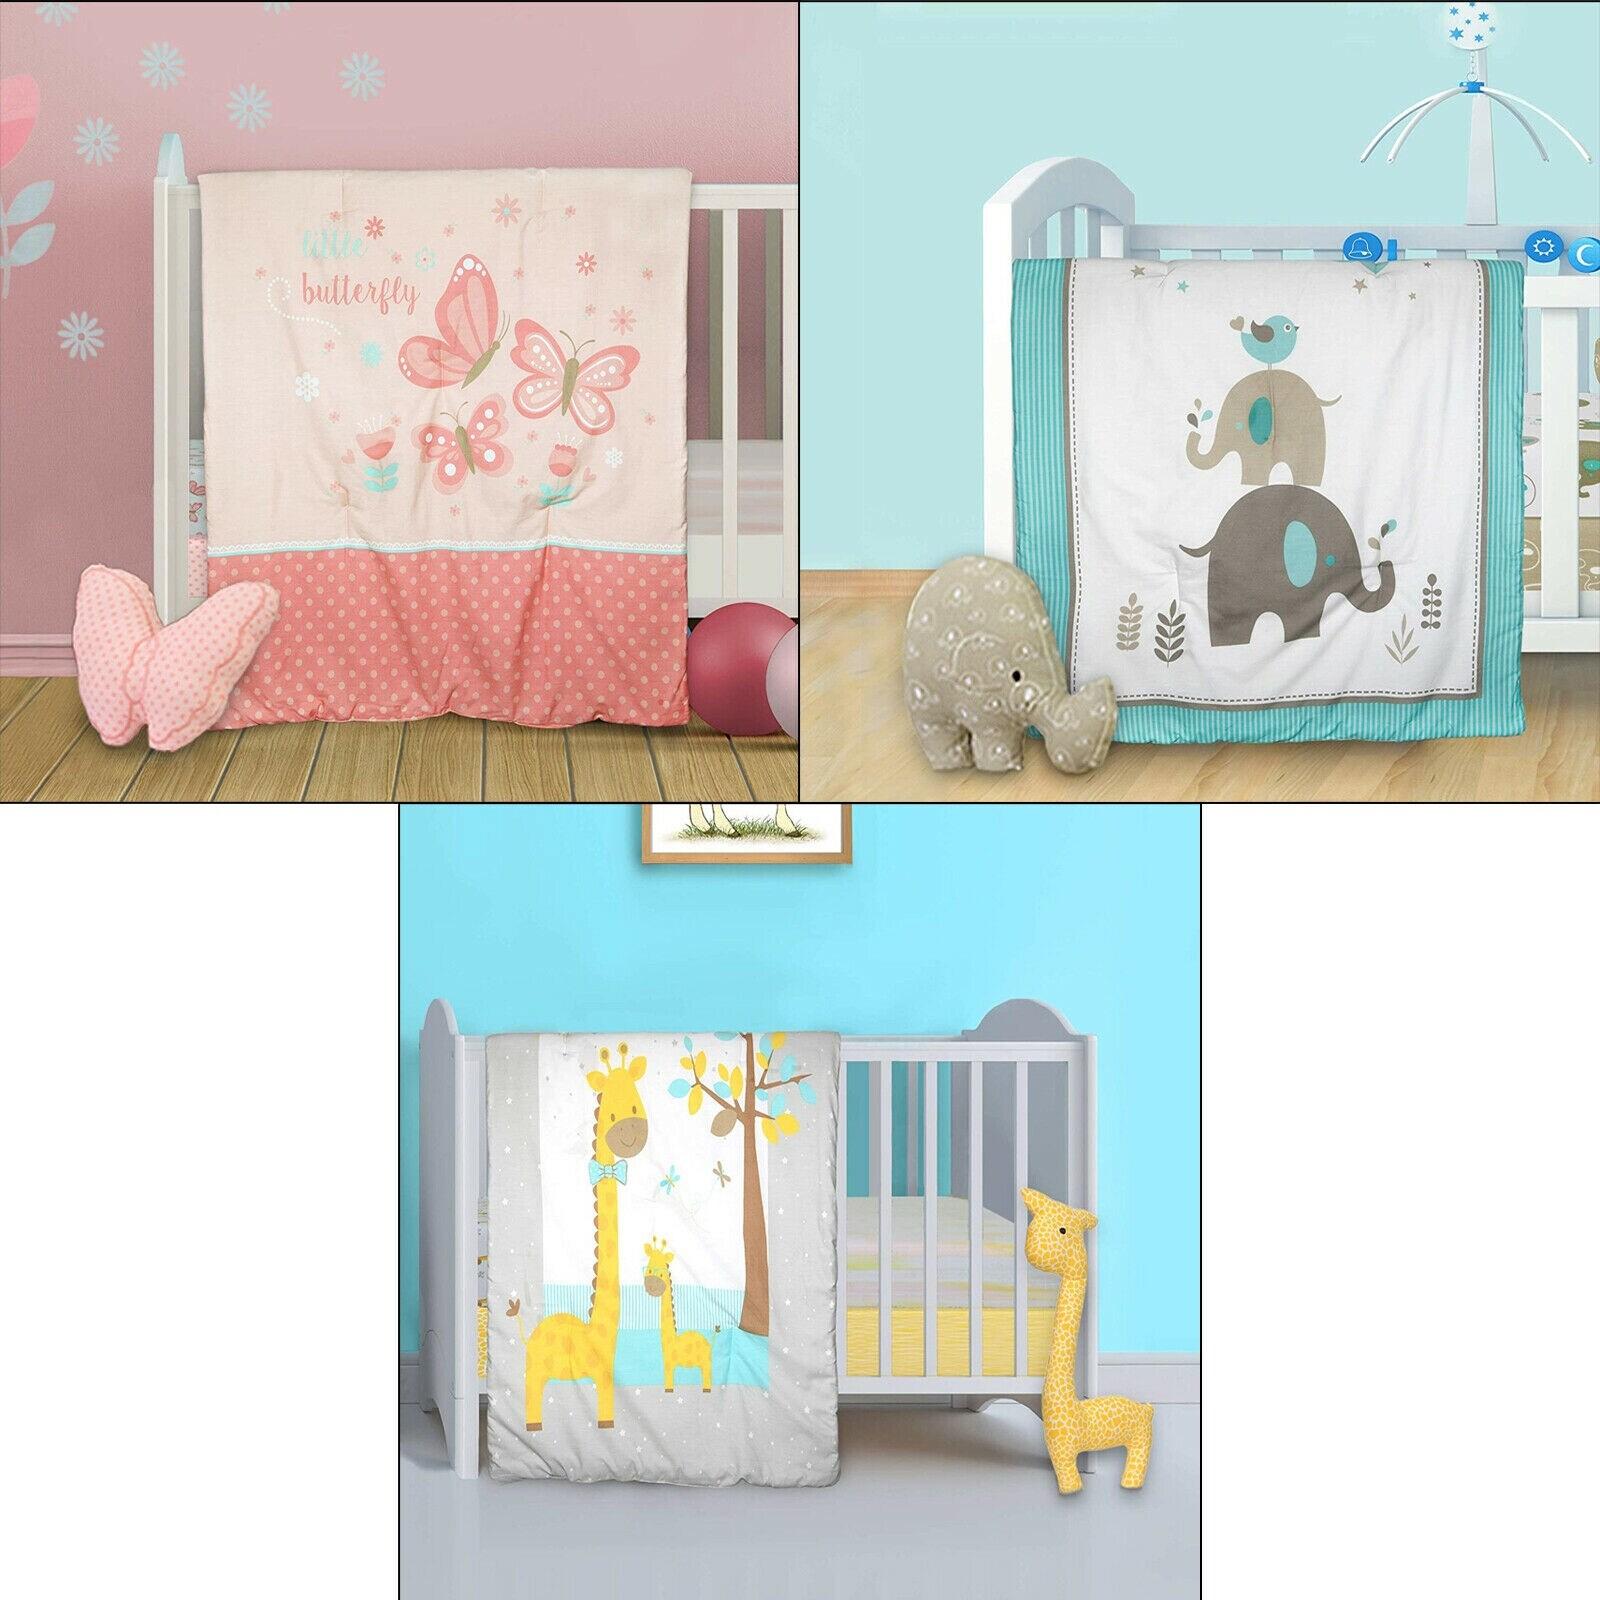 Cuddles Cribs 2 Piece Baby Crib Bedding Set Gots Certified Overstock 28526654